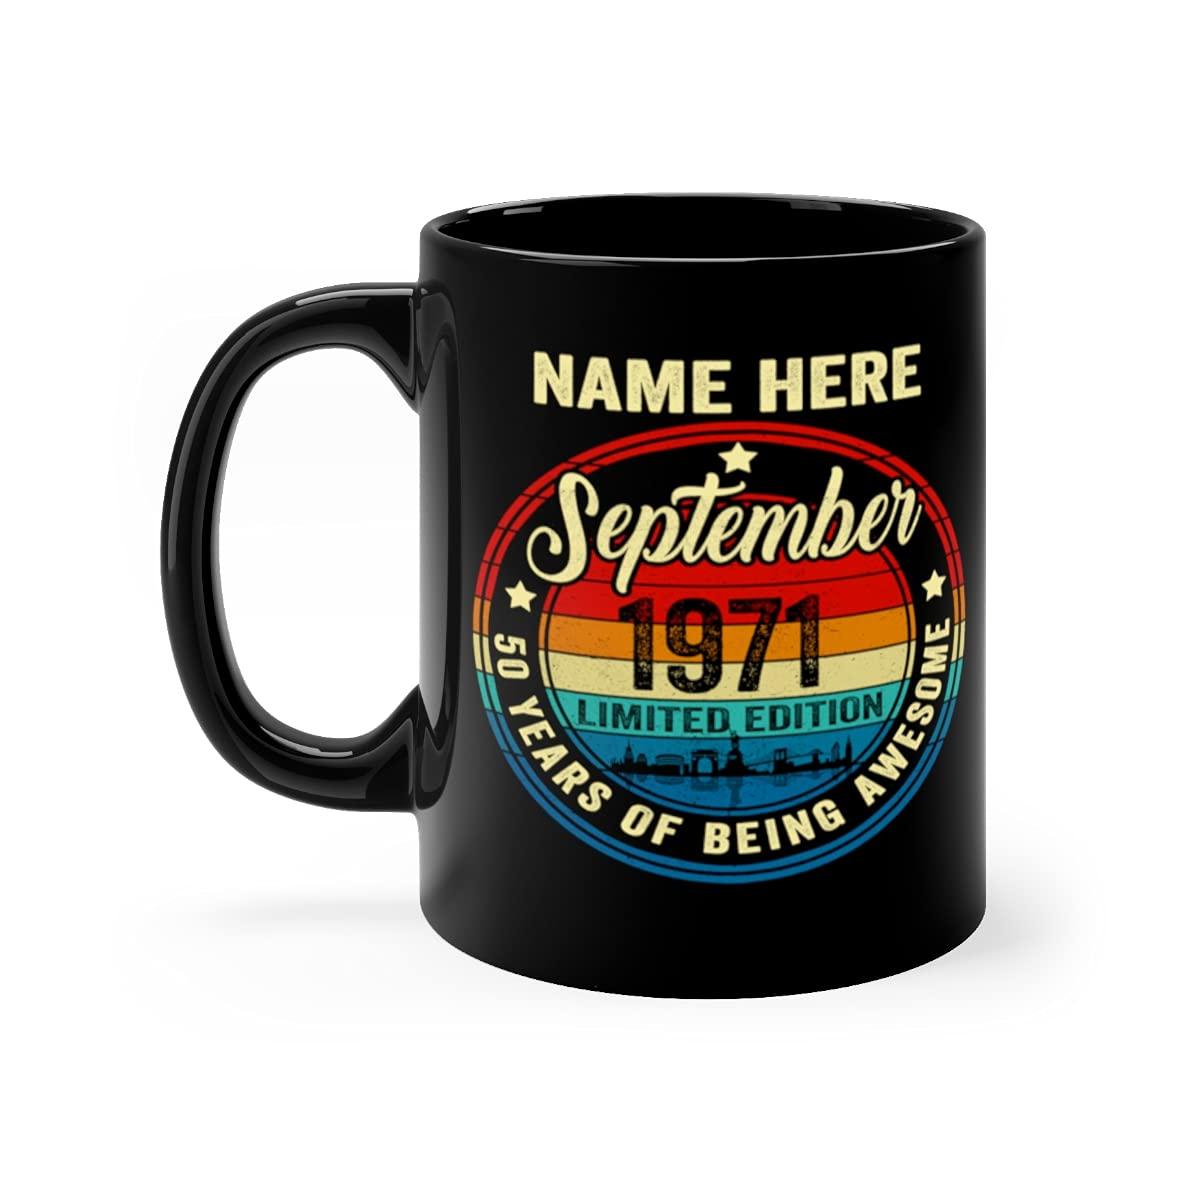 Custom Name Month Year 50th 19 Free Very popular! shipping on posting reviews September Mug Birthday Vintage